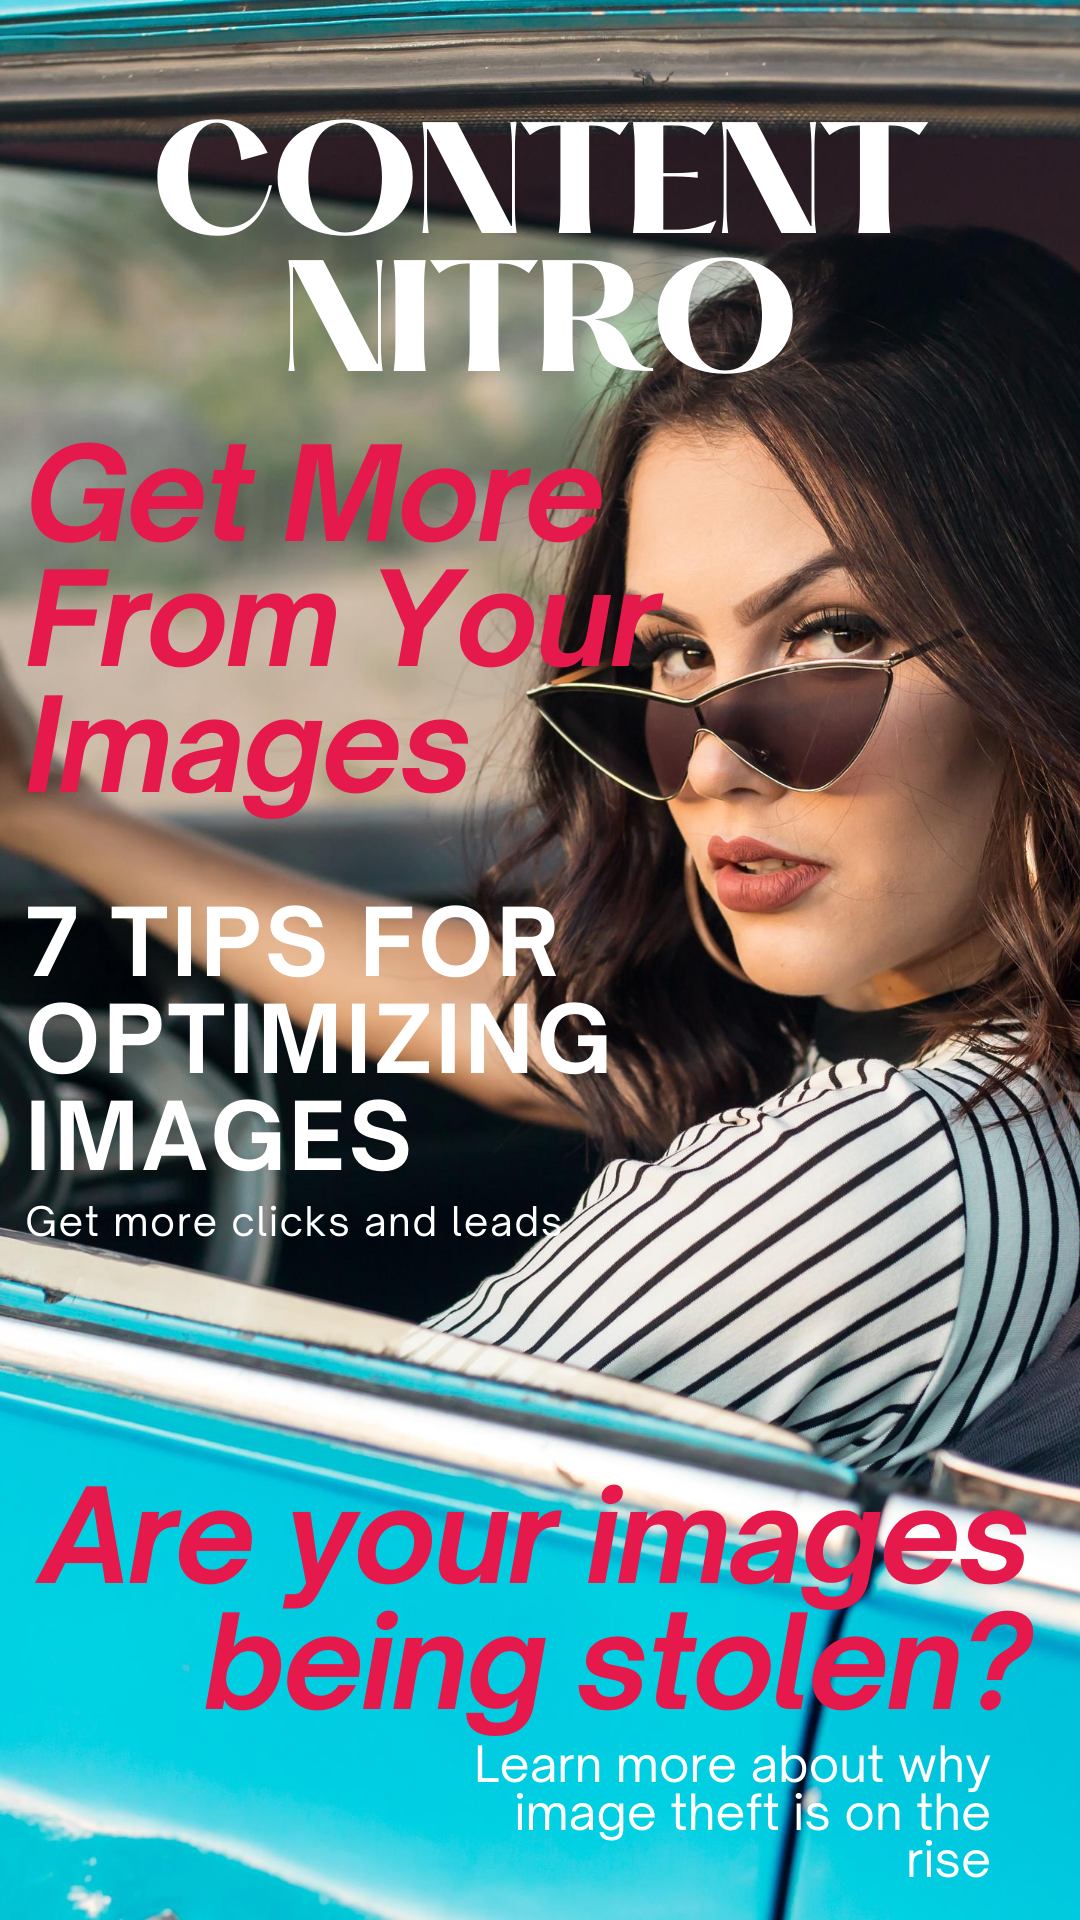 7 Ways to Optimize Your Images For Clicks & Leads via @saraharrow